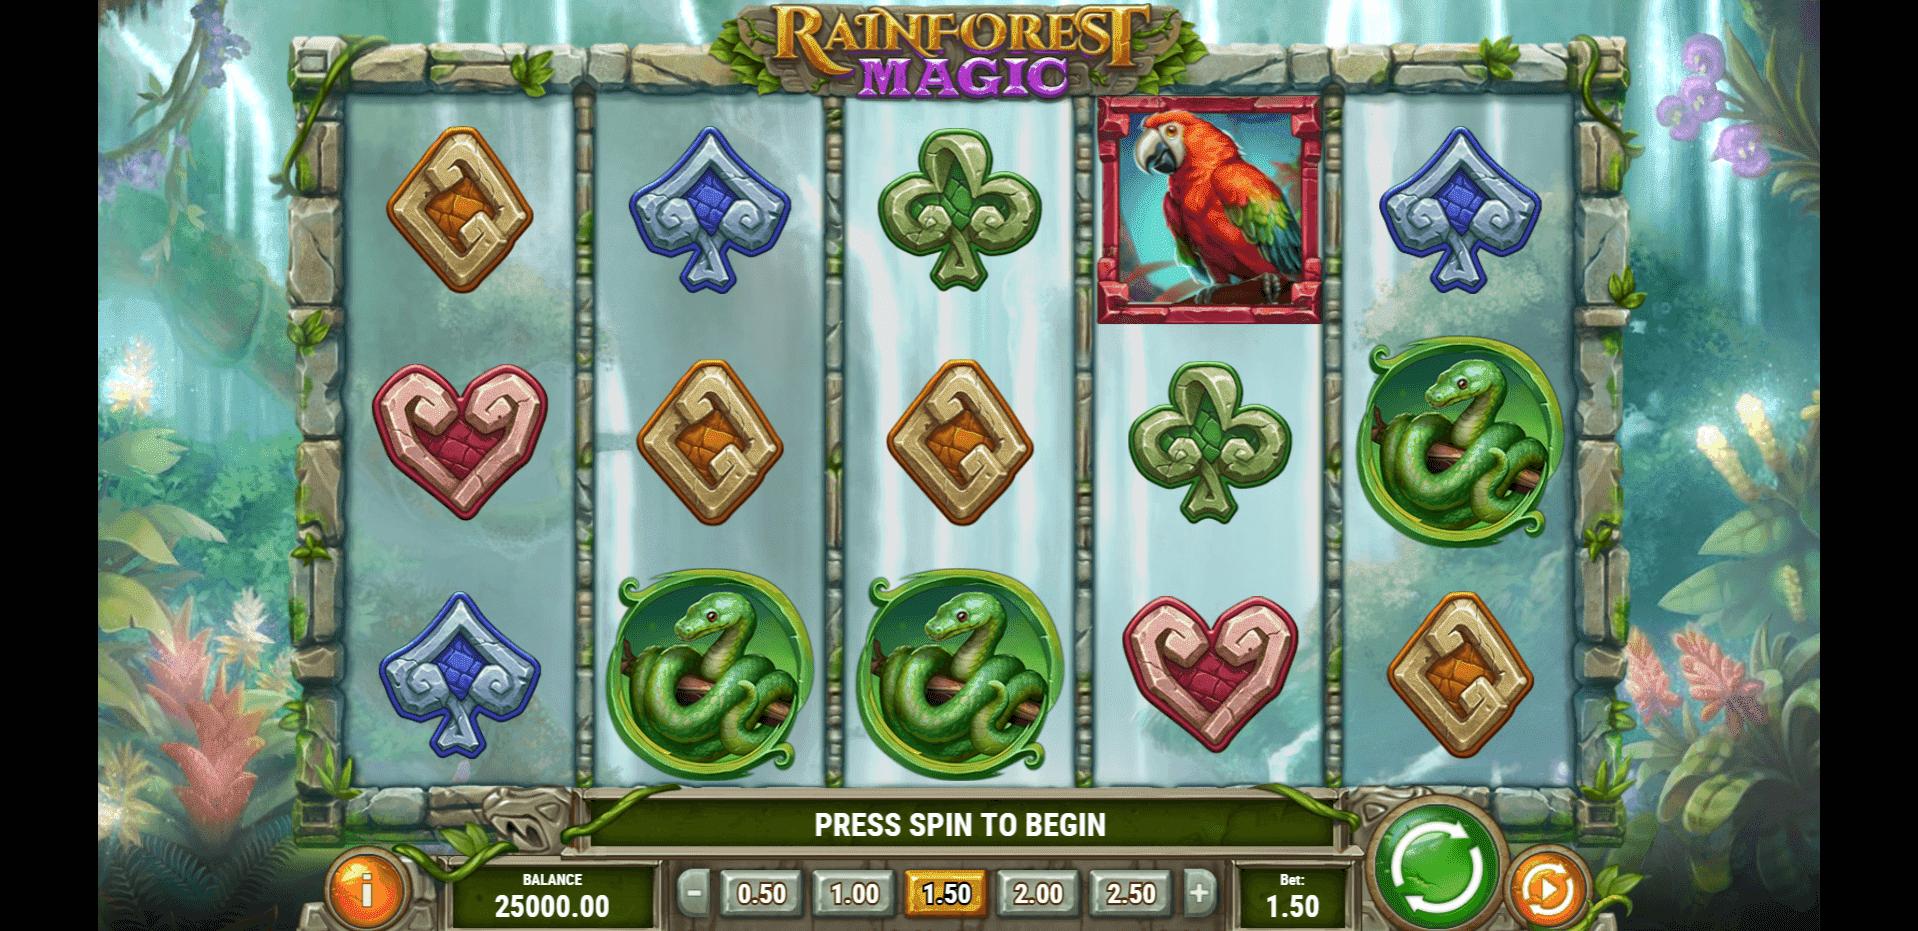 Rainforest Magic slot machine screenshot